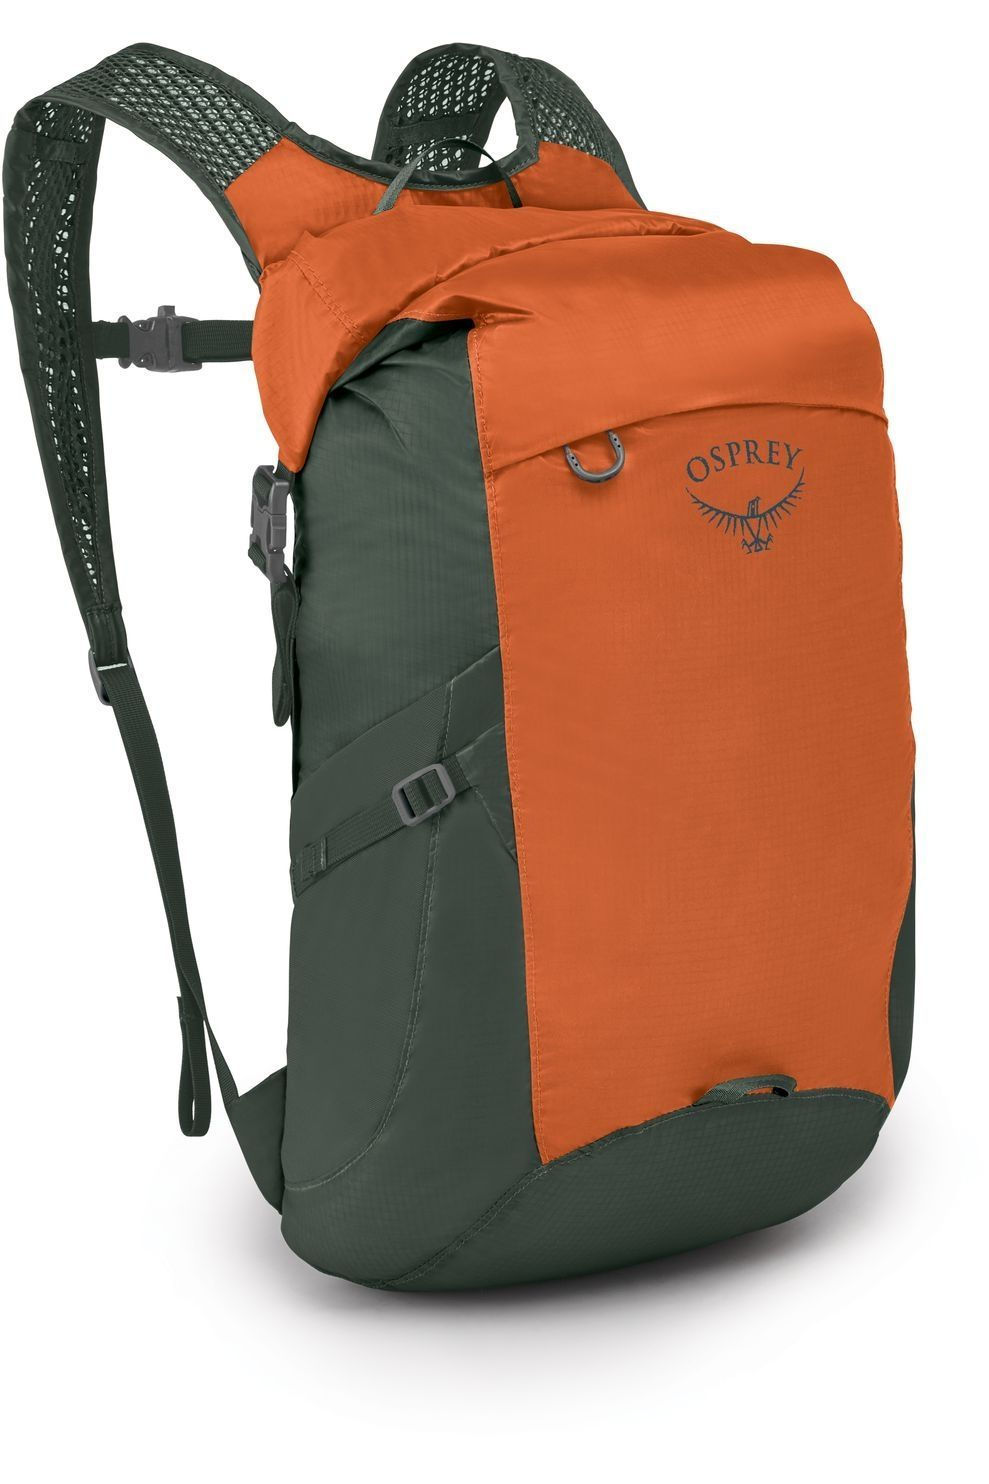 Osprey Dagrugzak Ul Dry Stuff Sack - Oranje/Grijs